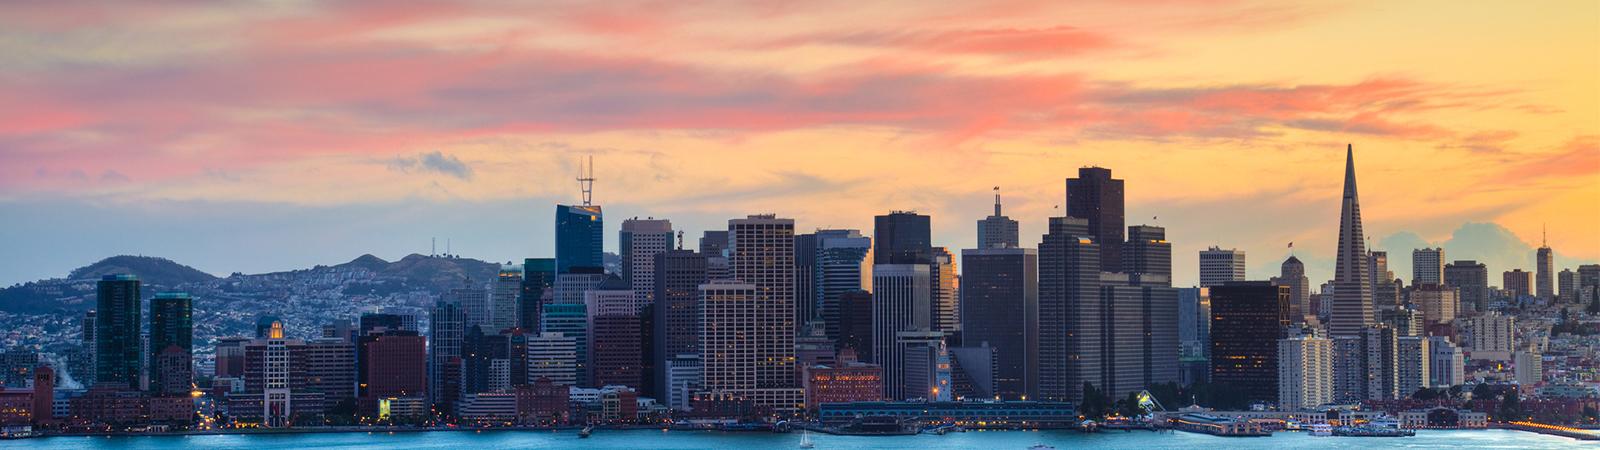 San Francisco City skyline photo